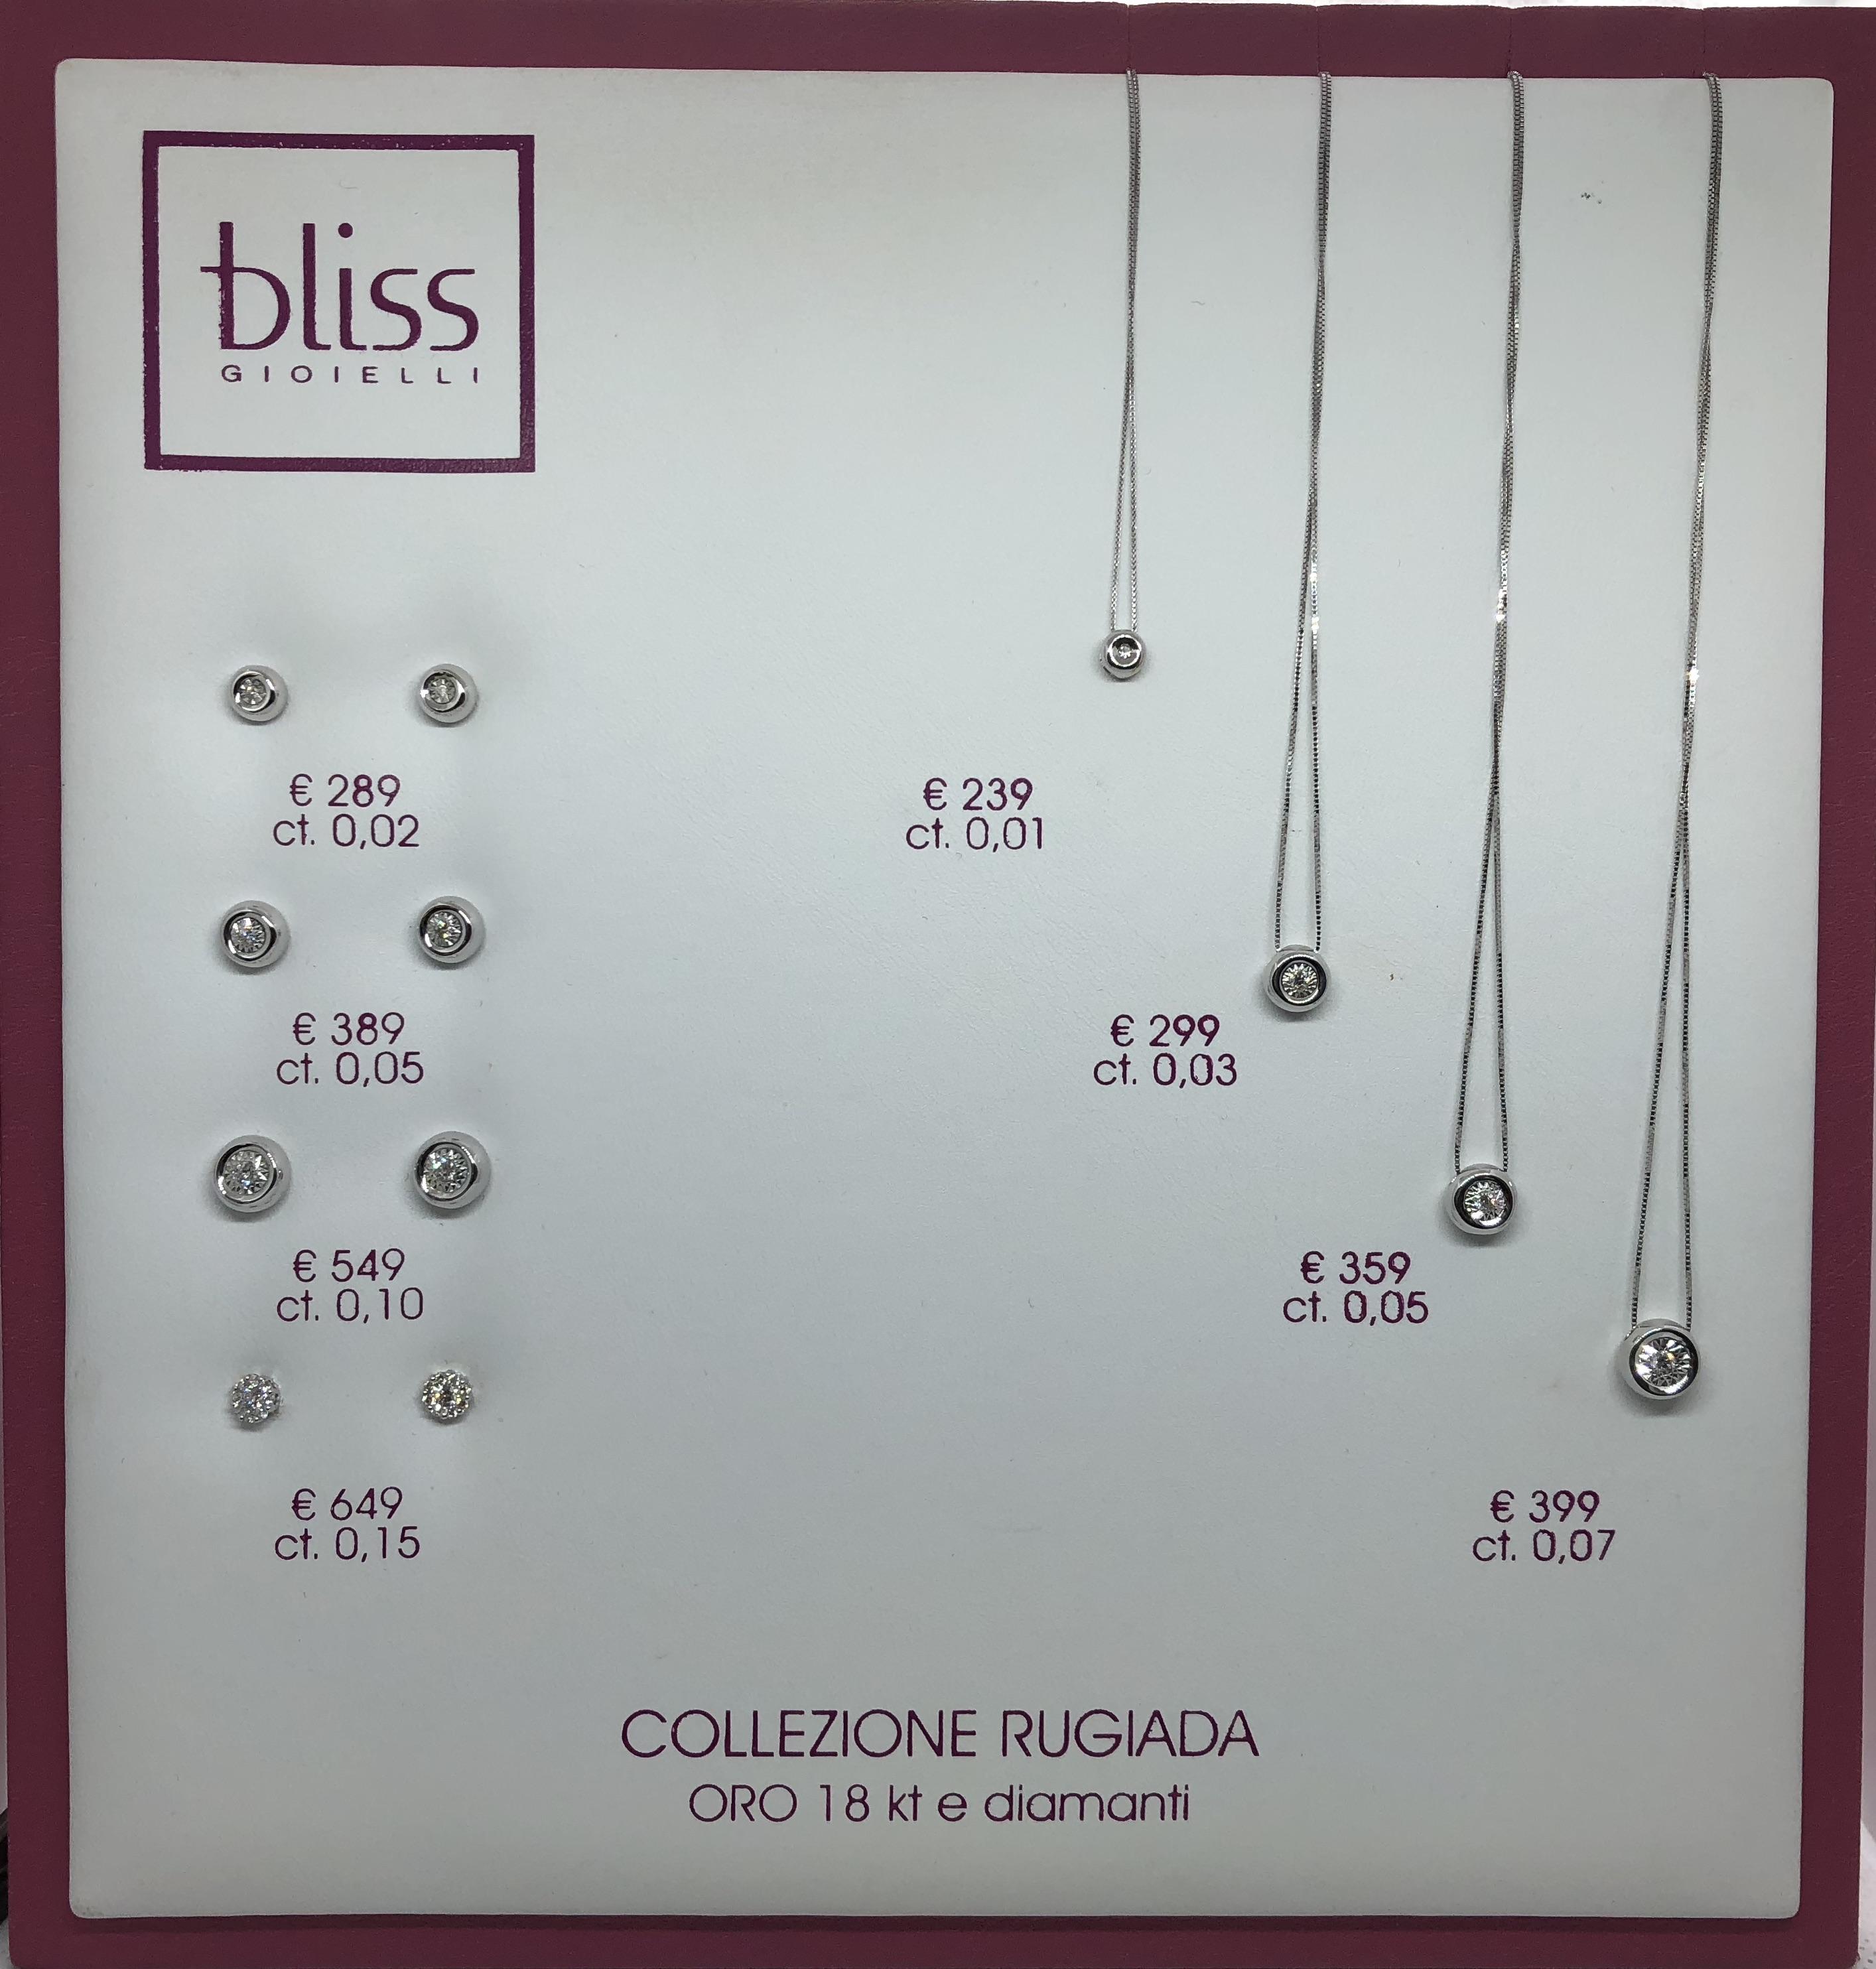 Bliss - Gioielleria Censi